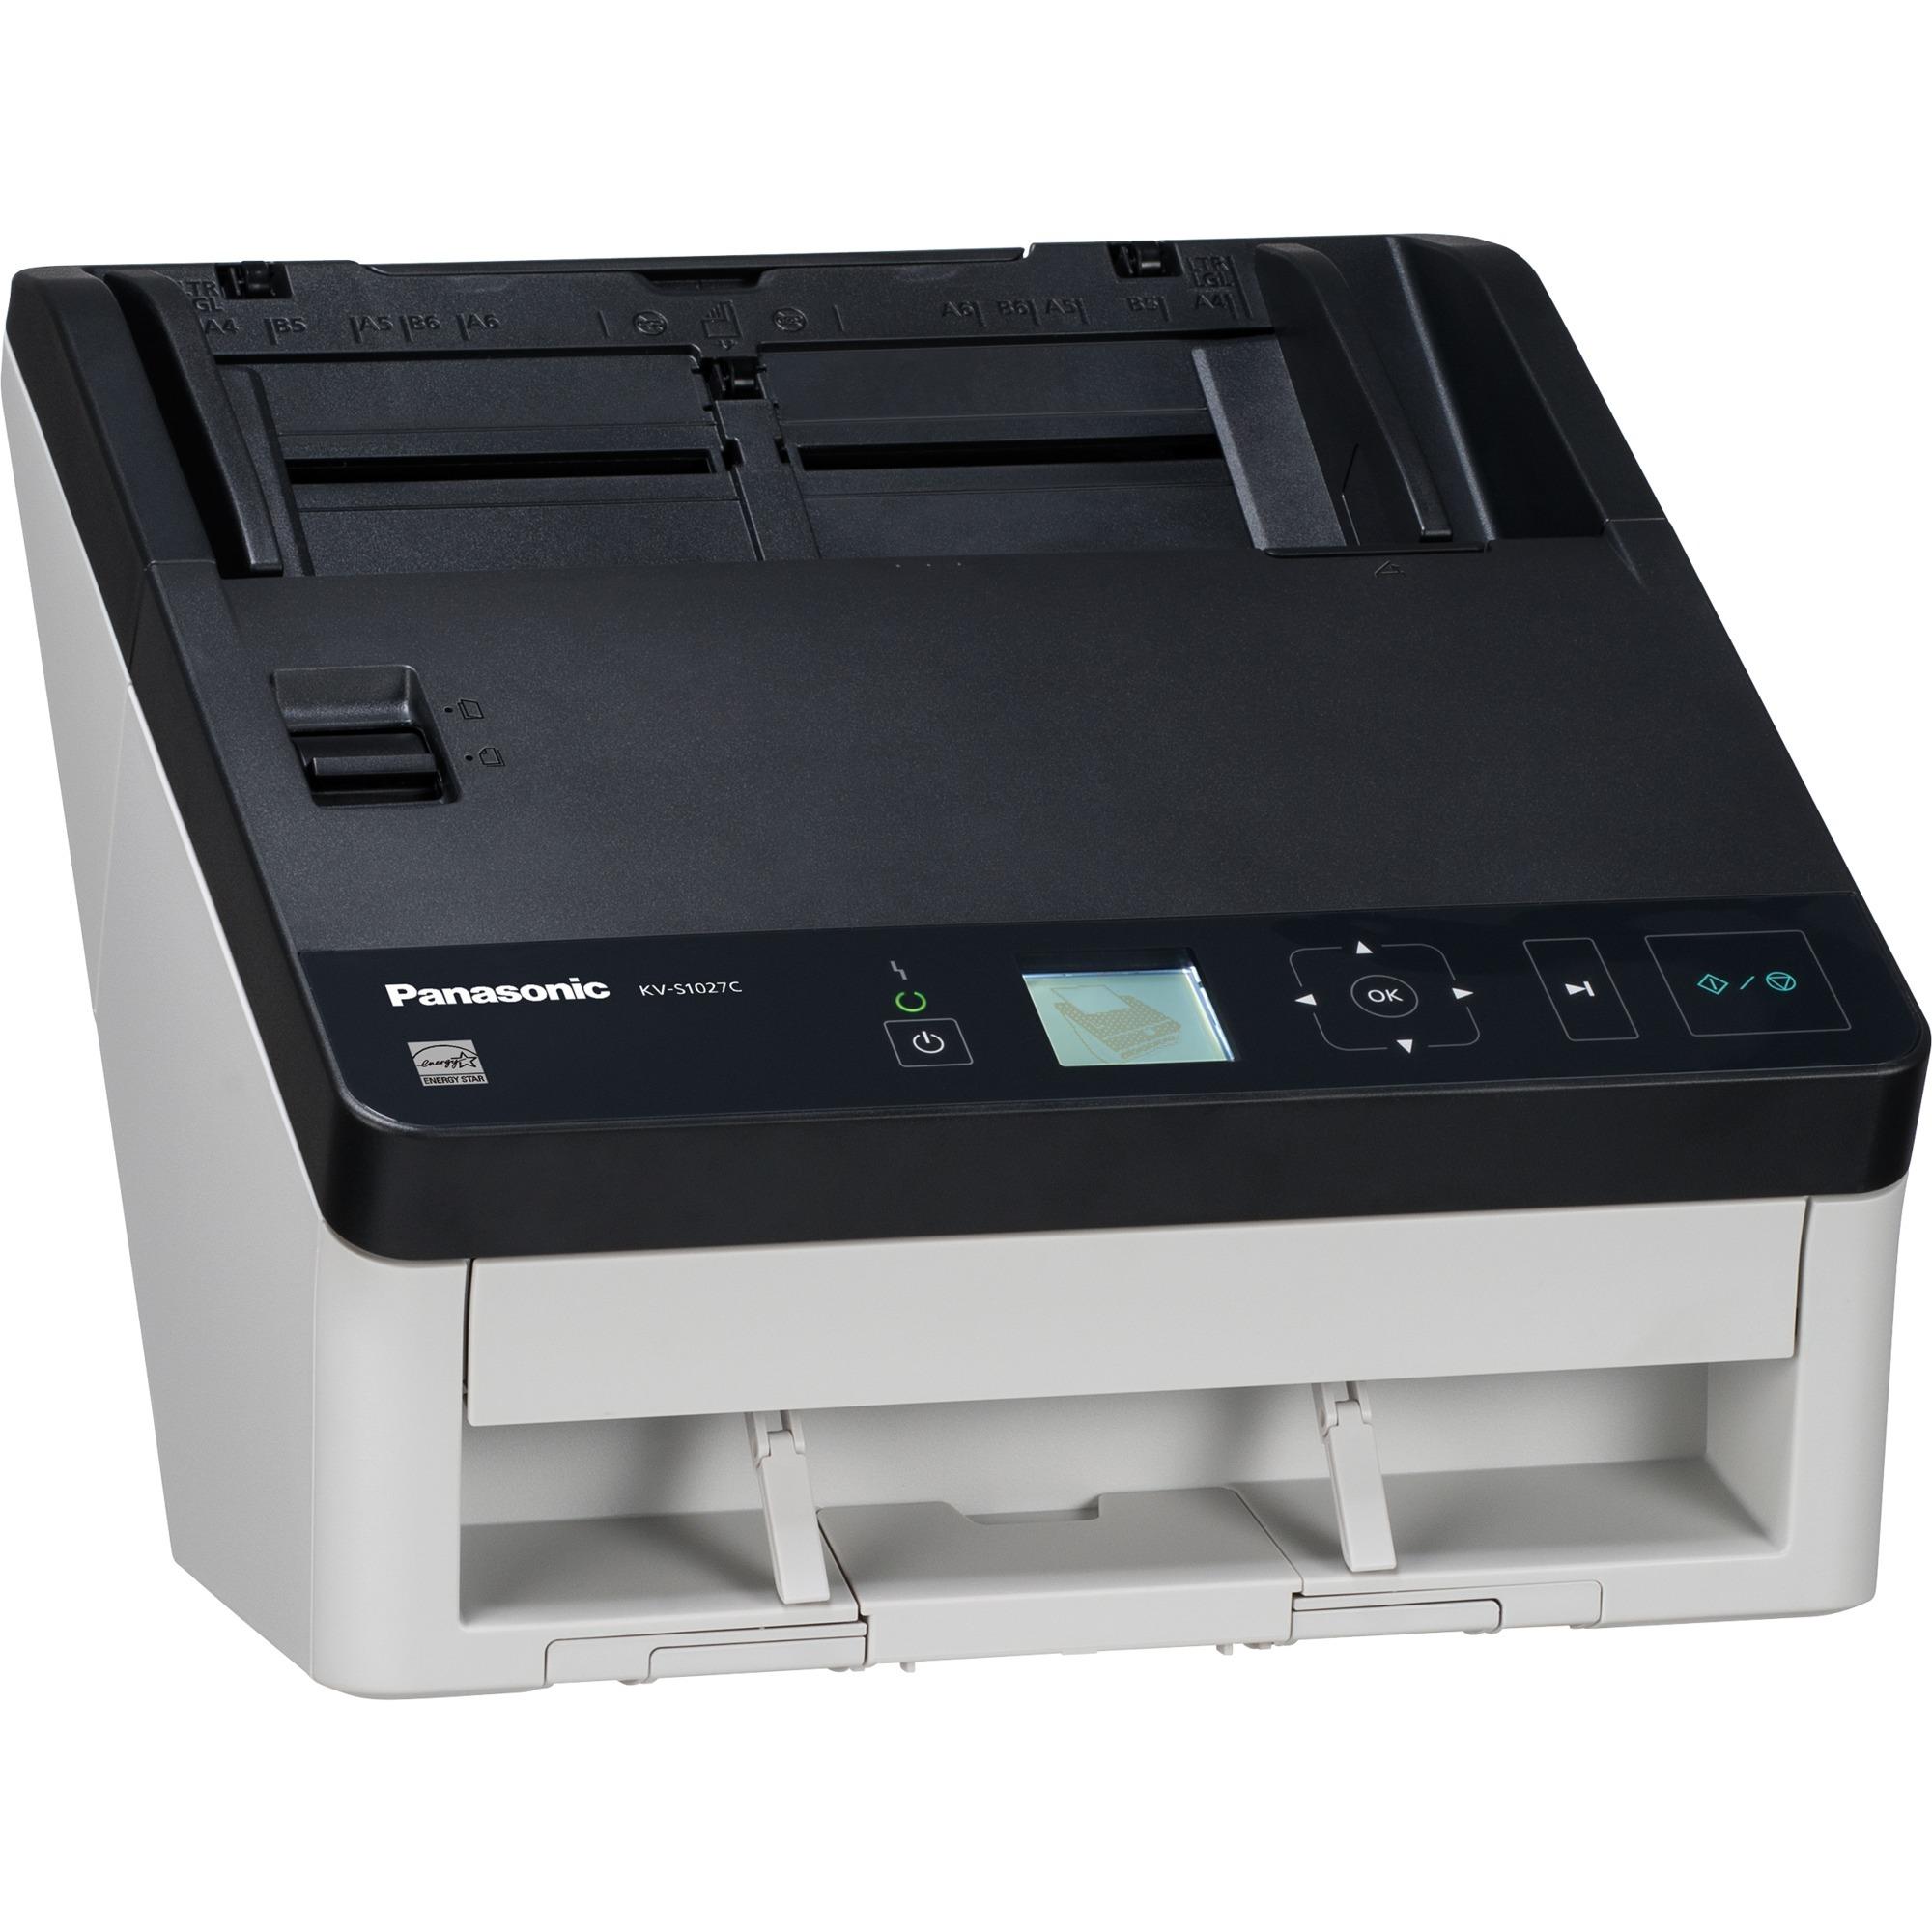 KV-S1027C-U Scanner ADF 300 x 600DPI A4 Noir, Blanc scanner